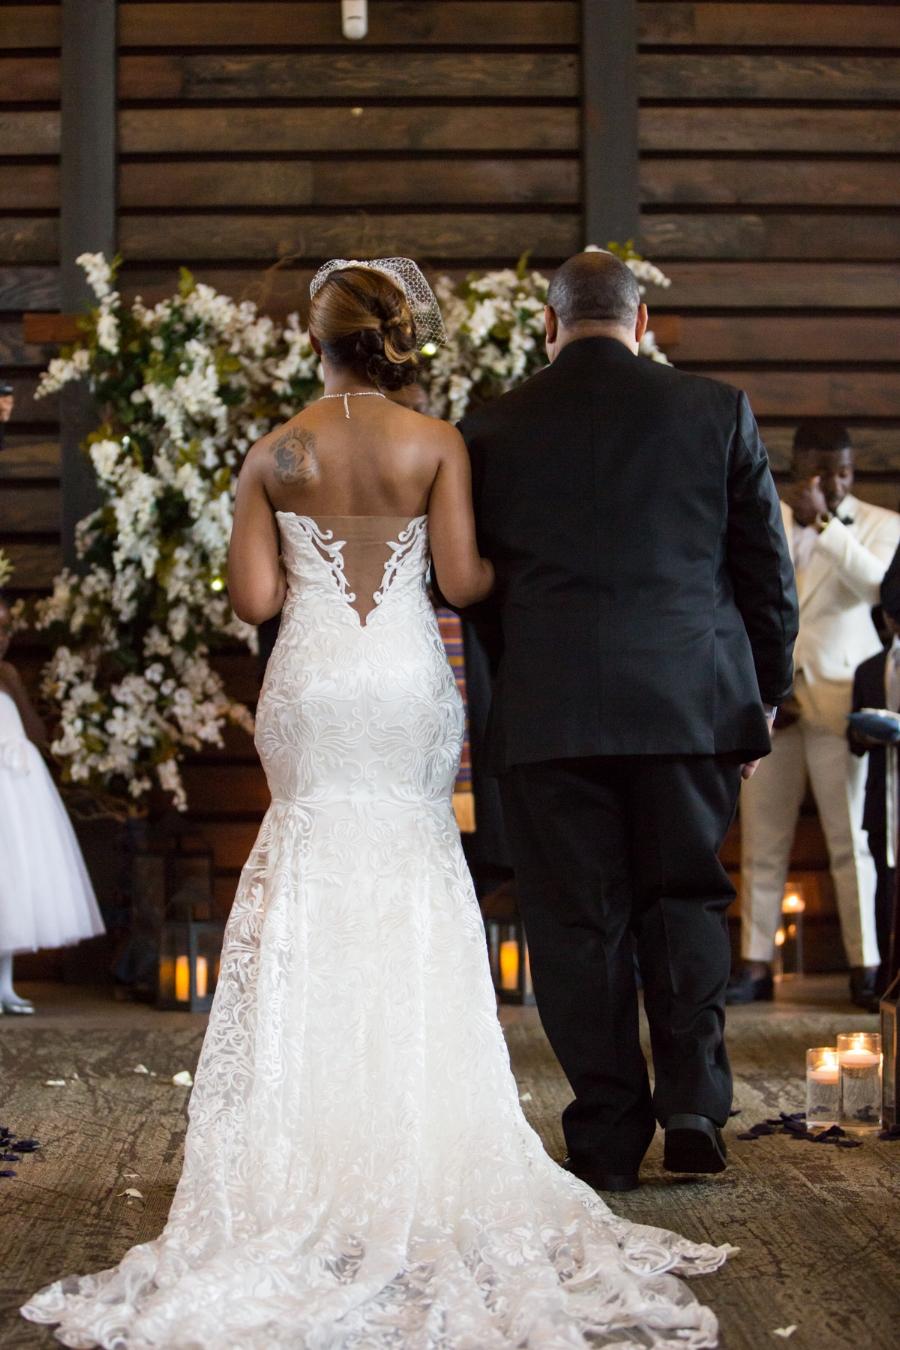 The wedding dress was stunning.